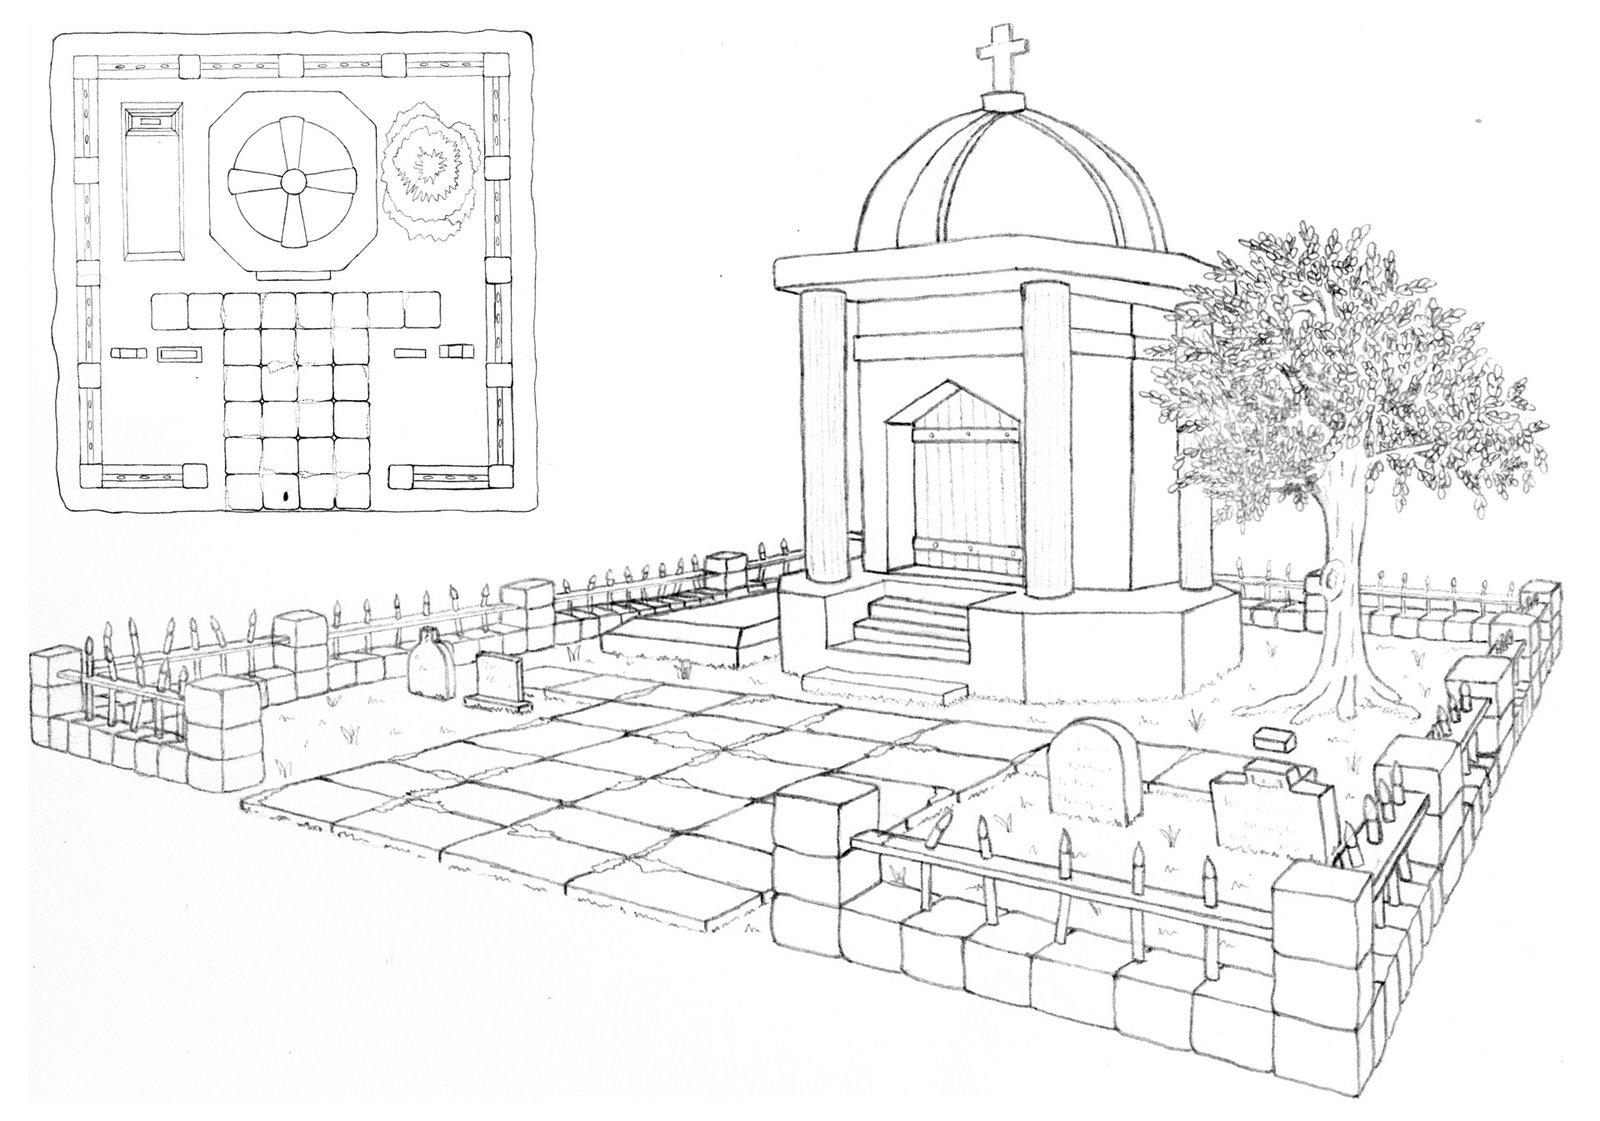 Drawn graveyard crypt Concept by Crypt Graveyard hursty23